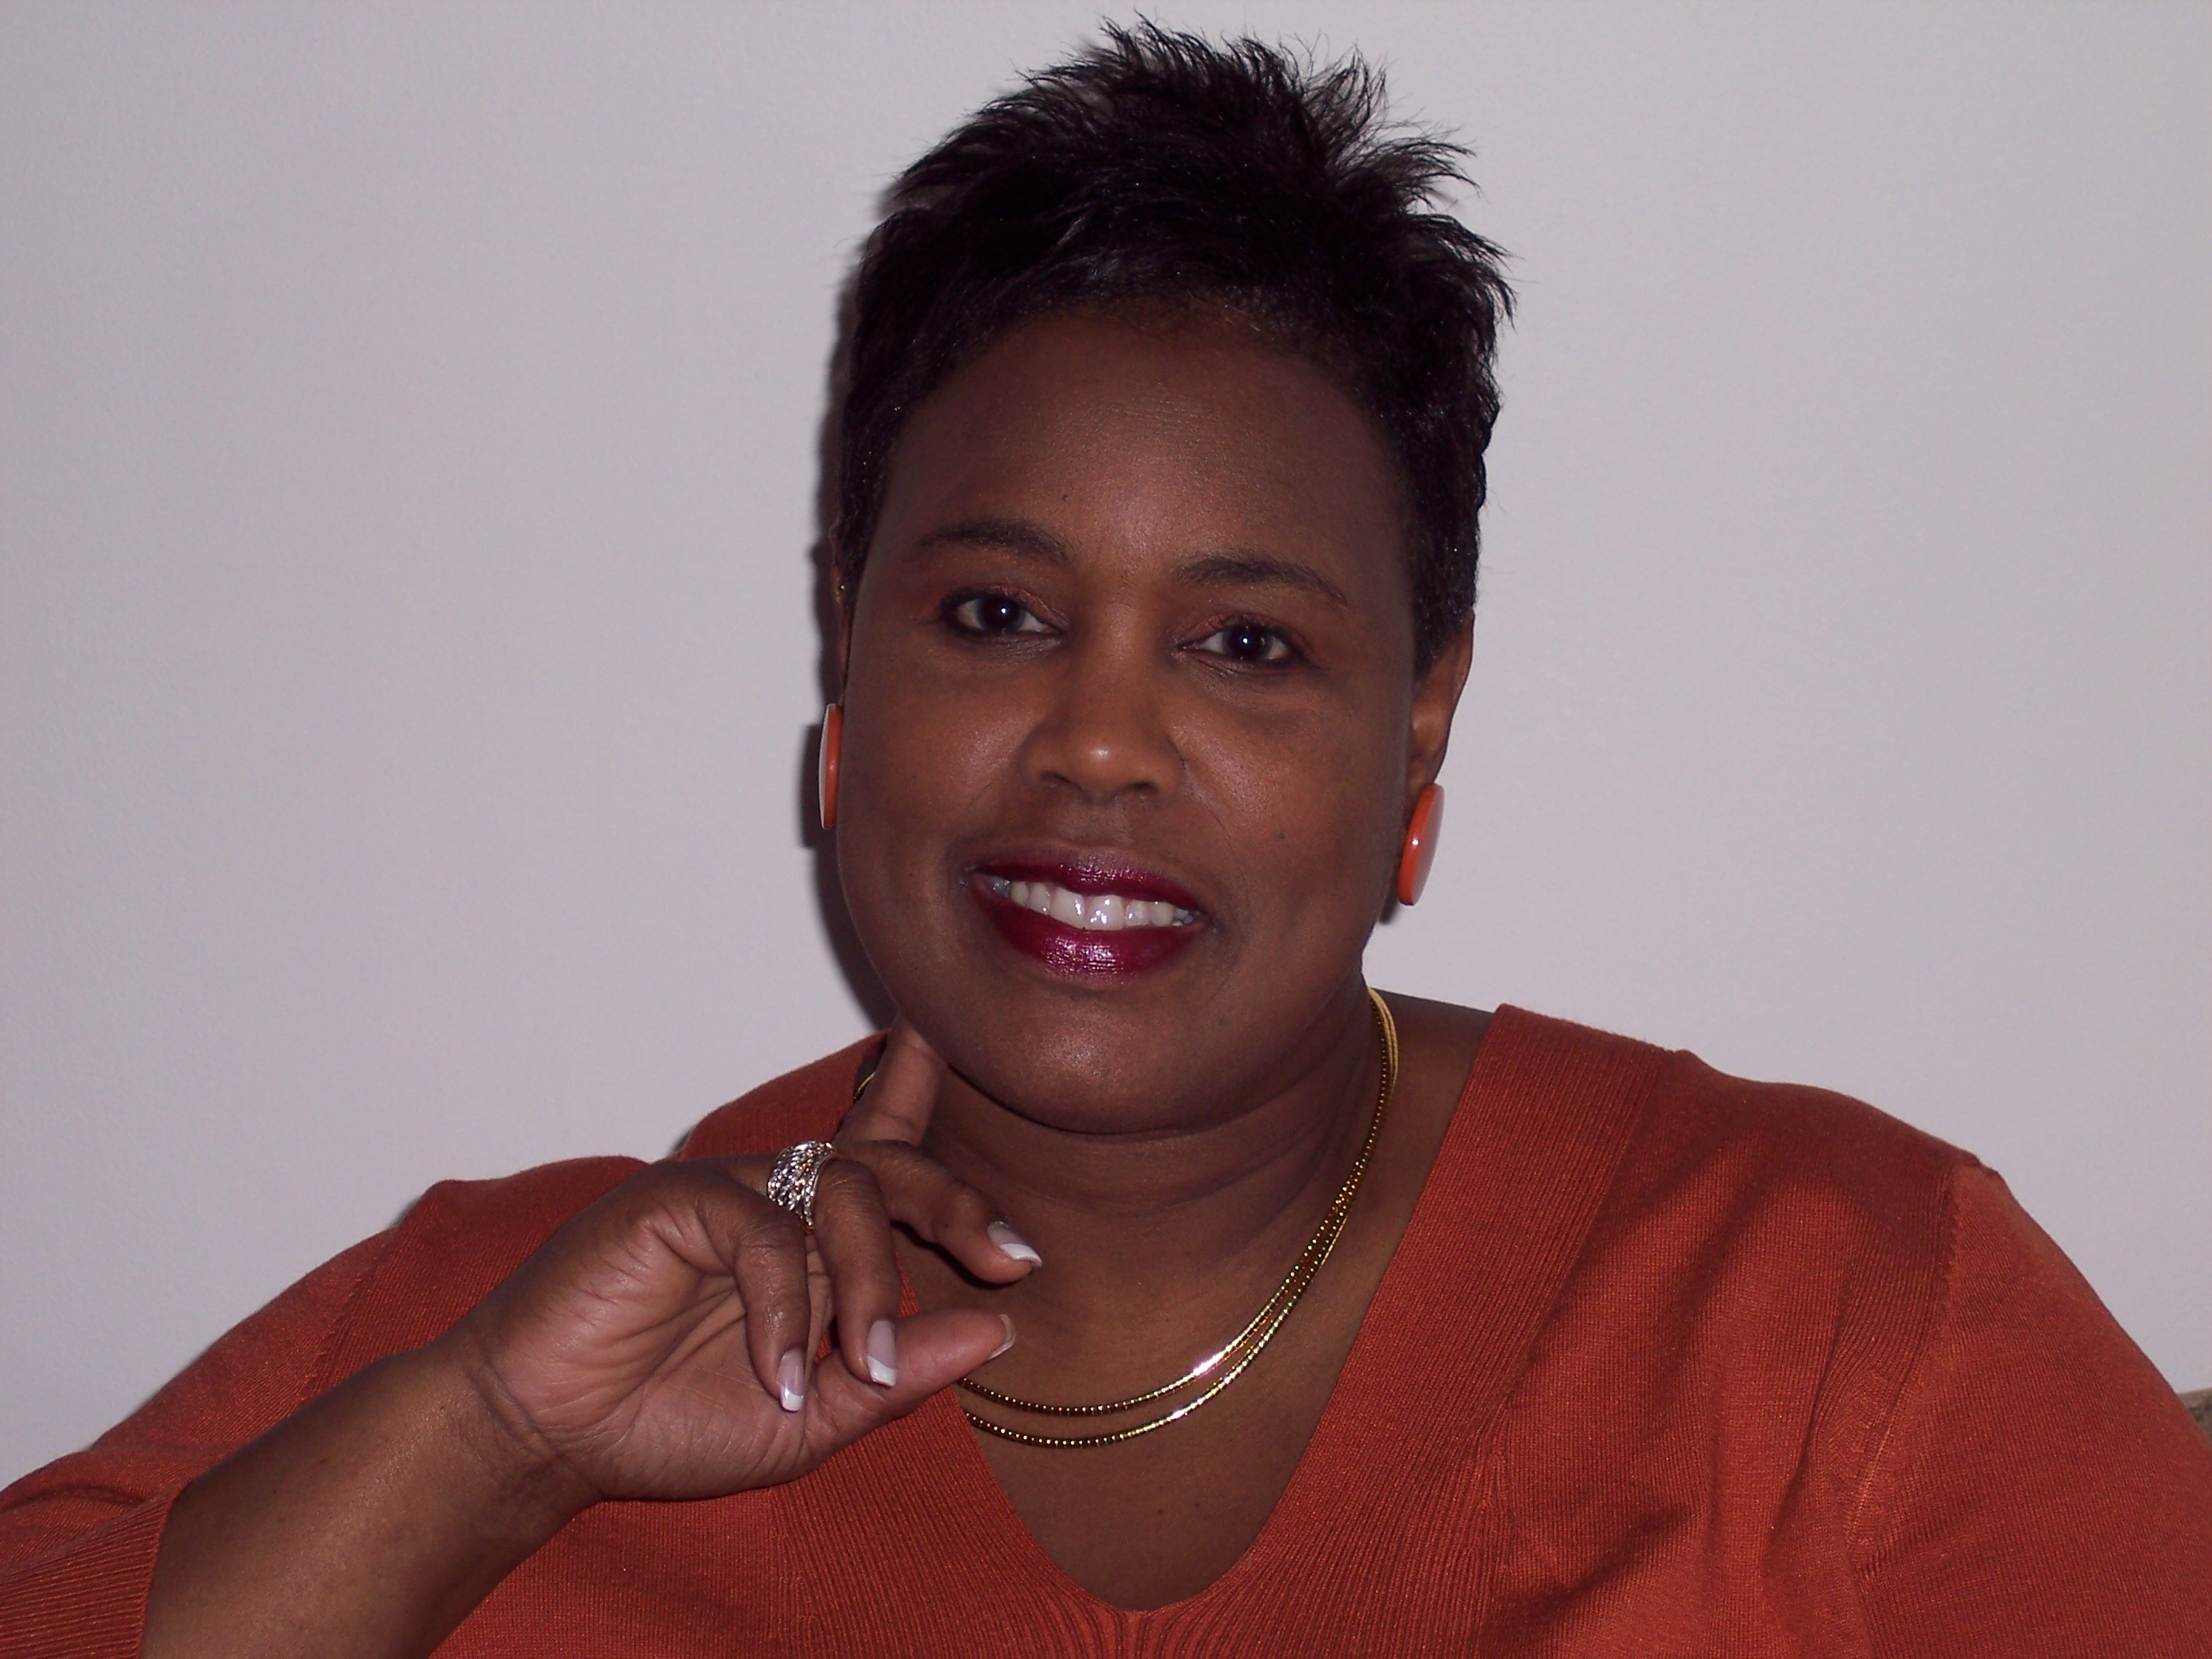 The Suzetta Perkins Reader S Companion Ebook By Suzetta border=